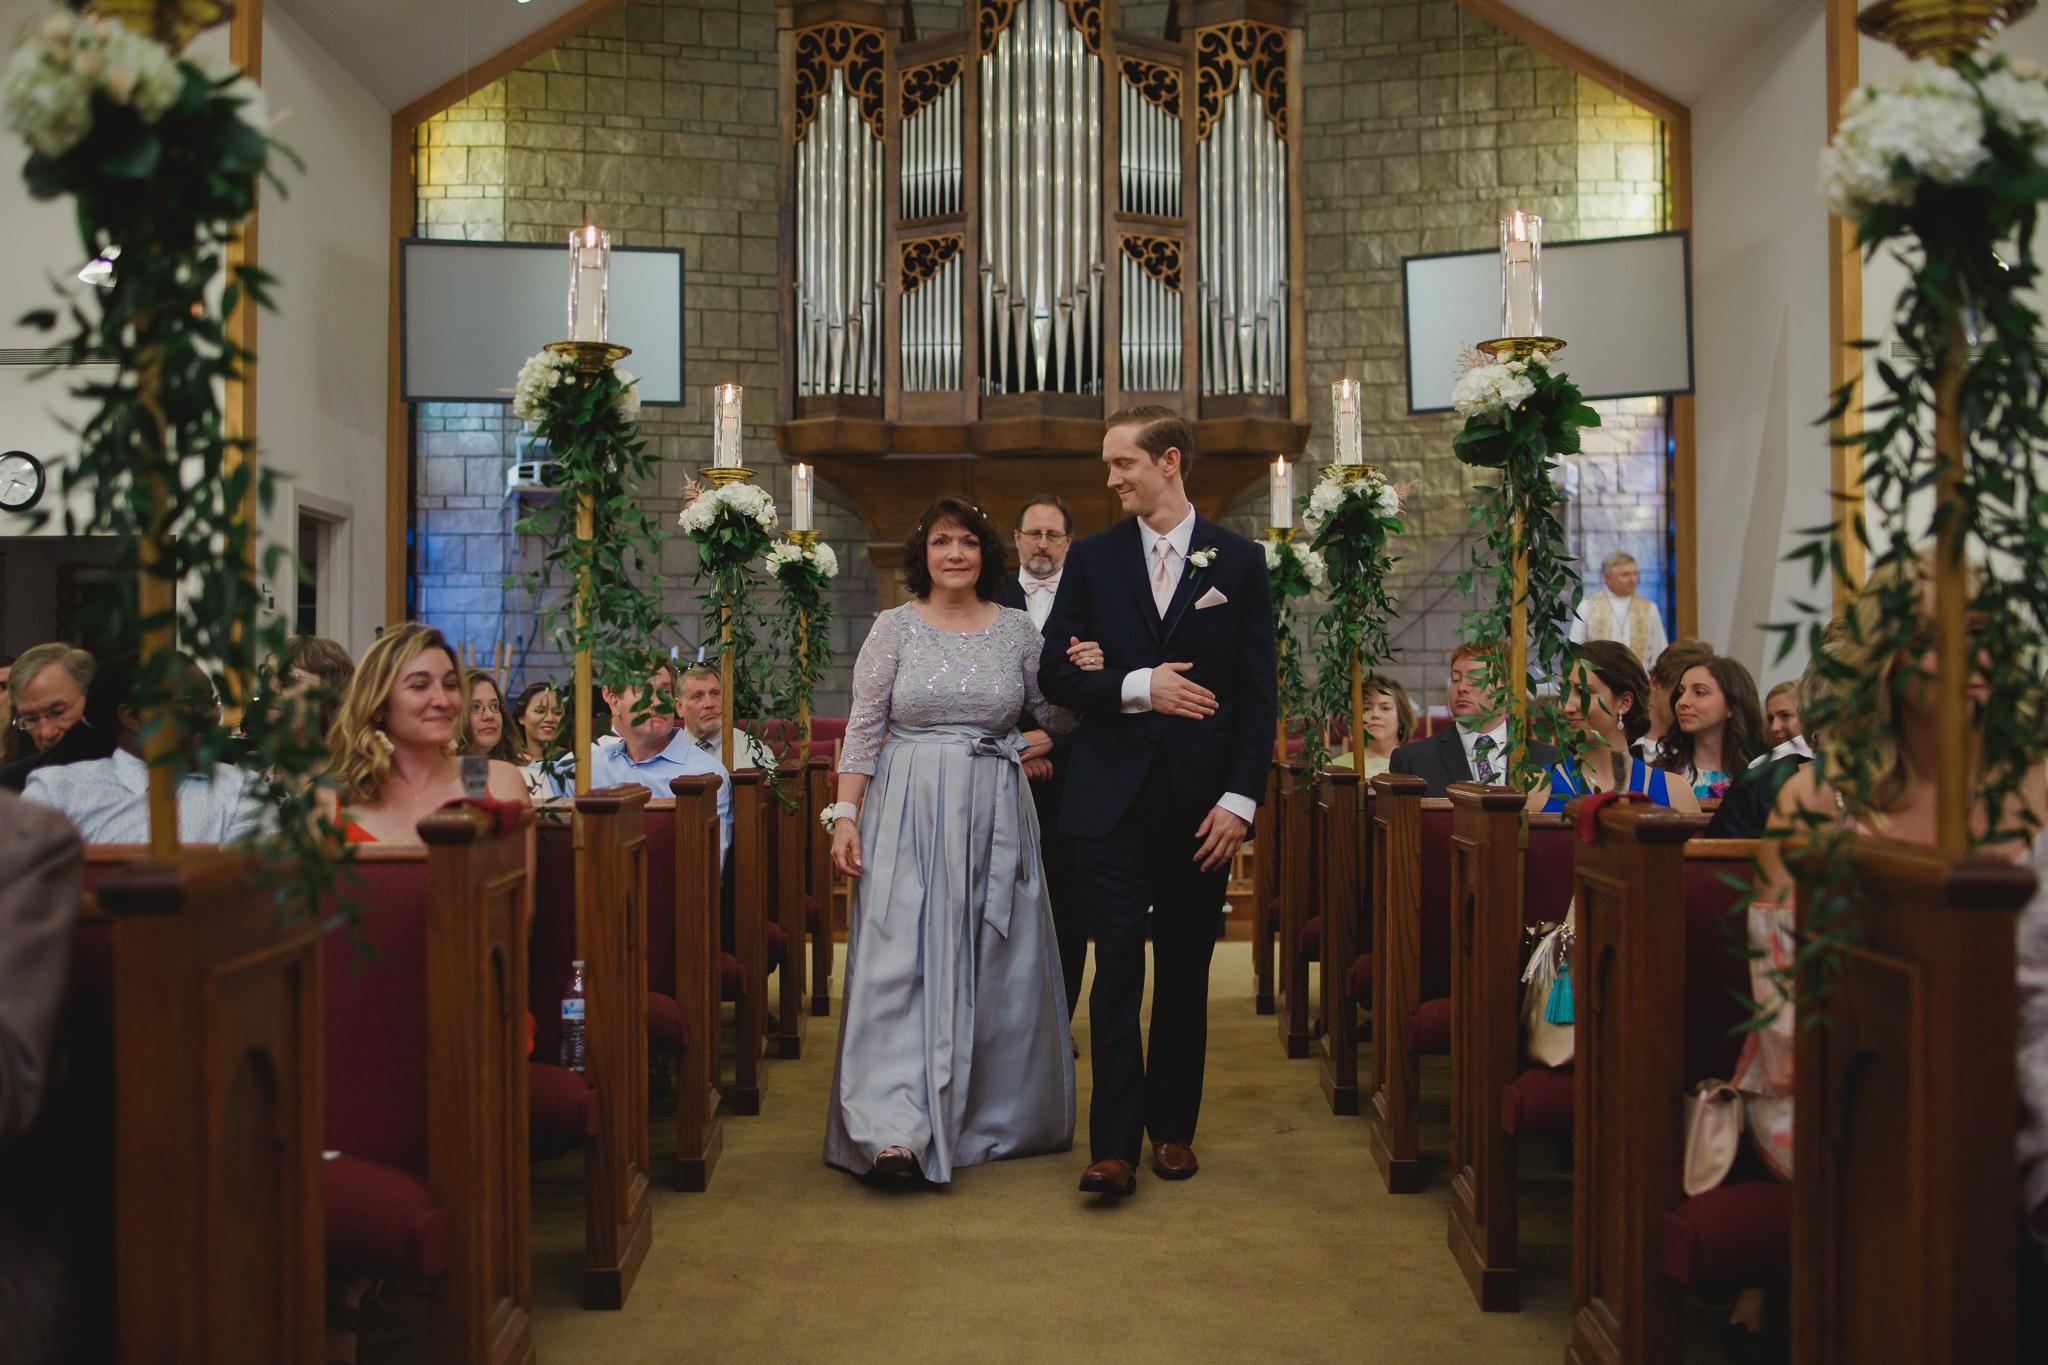 Michael and Kelly - the ashton depot - wedding DFW - wedding photographer- elizalde photography (15 of 150).jpg